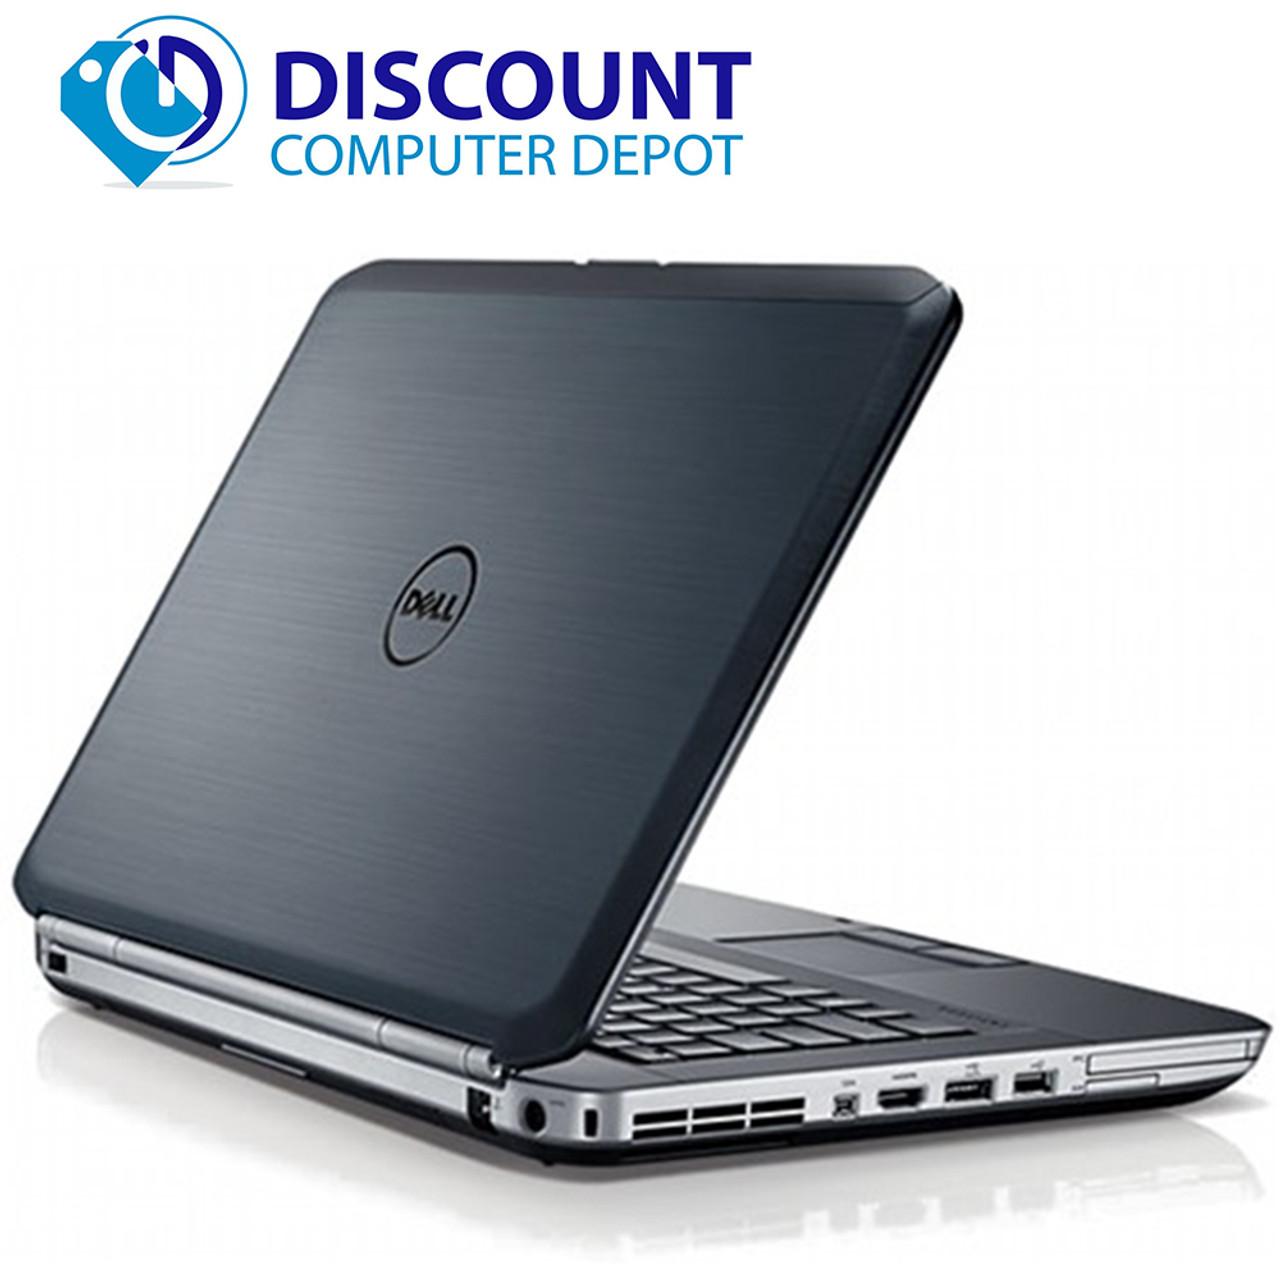 Dell Laptop Latitude E6430 Windows 10 Laptop PC i5-3rd Gen 4GB DVD WIFI HDMI